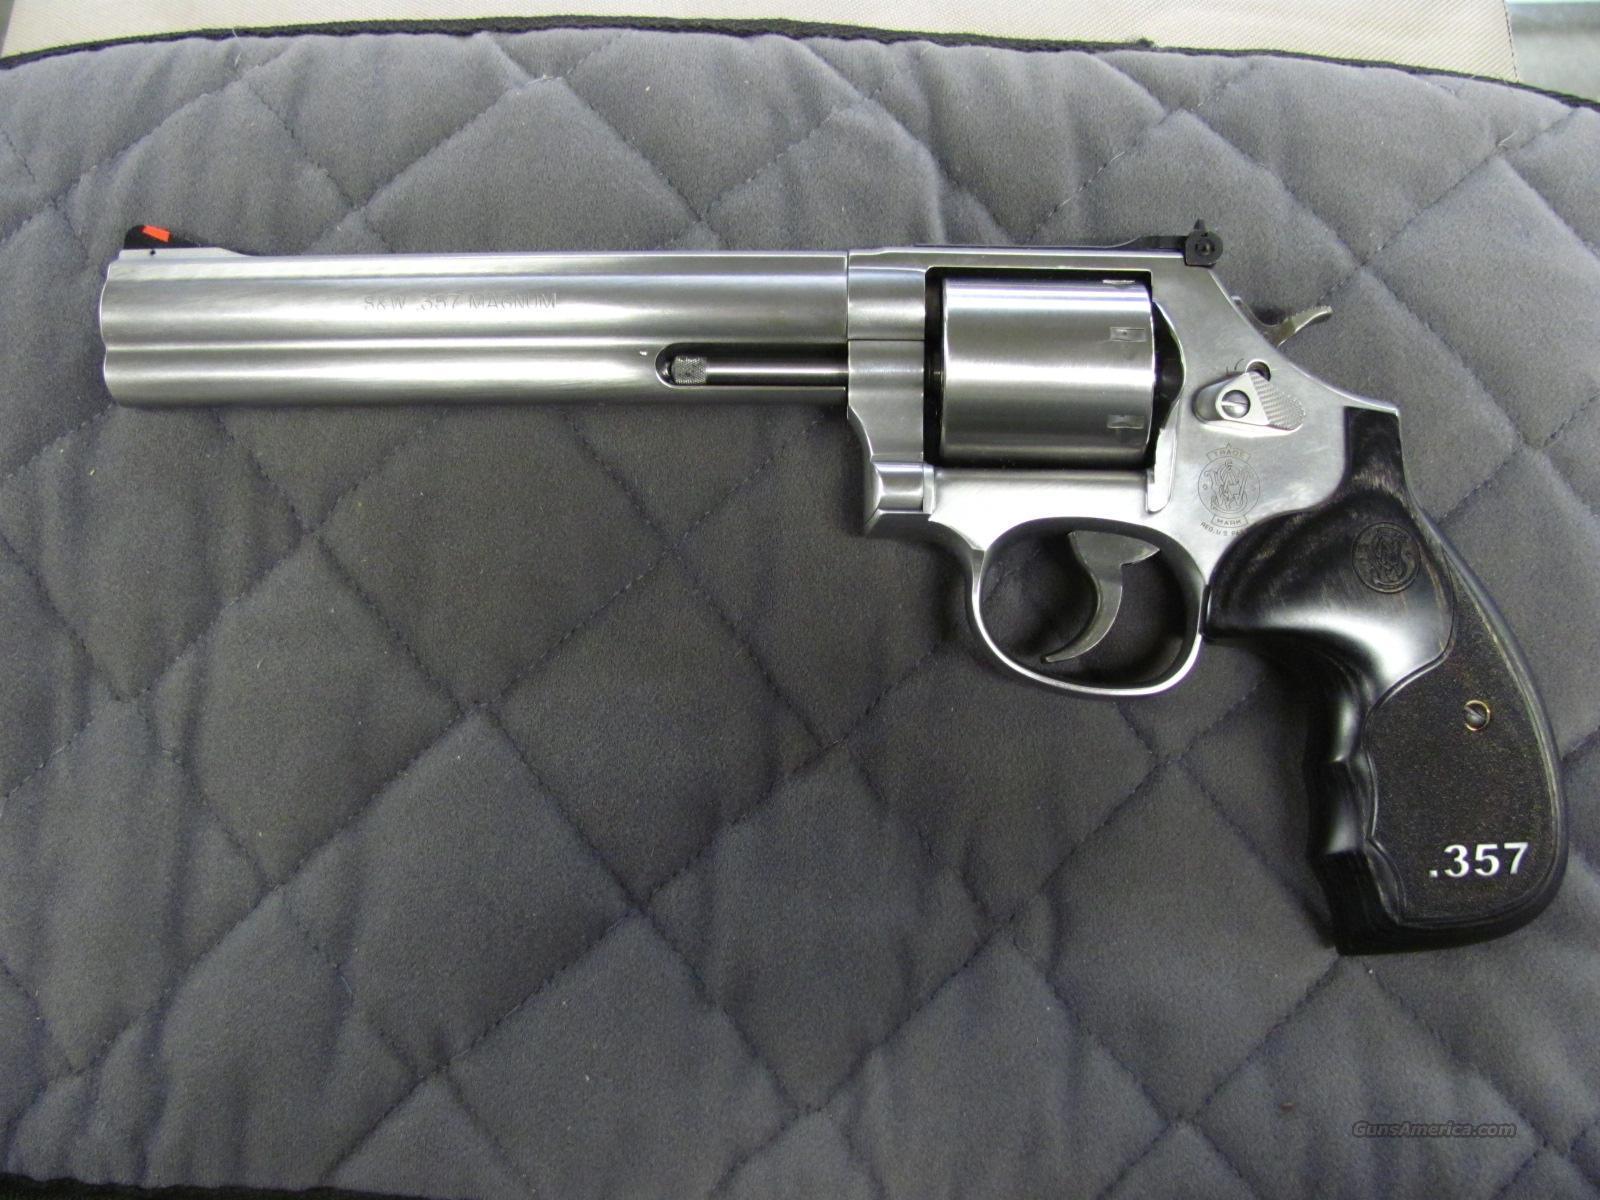 Smith & Wesson Model 686 Talo 3-5-7 Series 7 Inch 357 Mag  **NEW**  Guns > Pistols > Smith & Wesson Revolvers > Full Frame Revolver